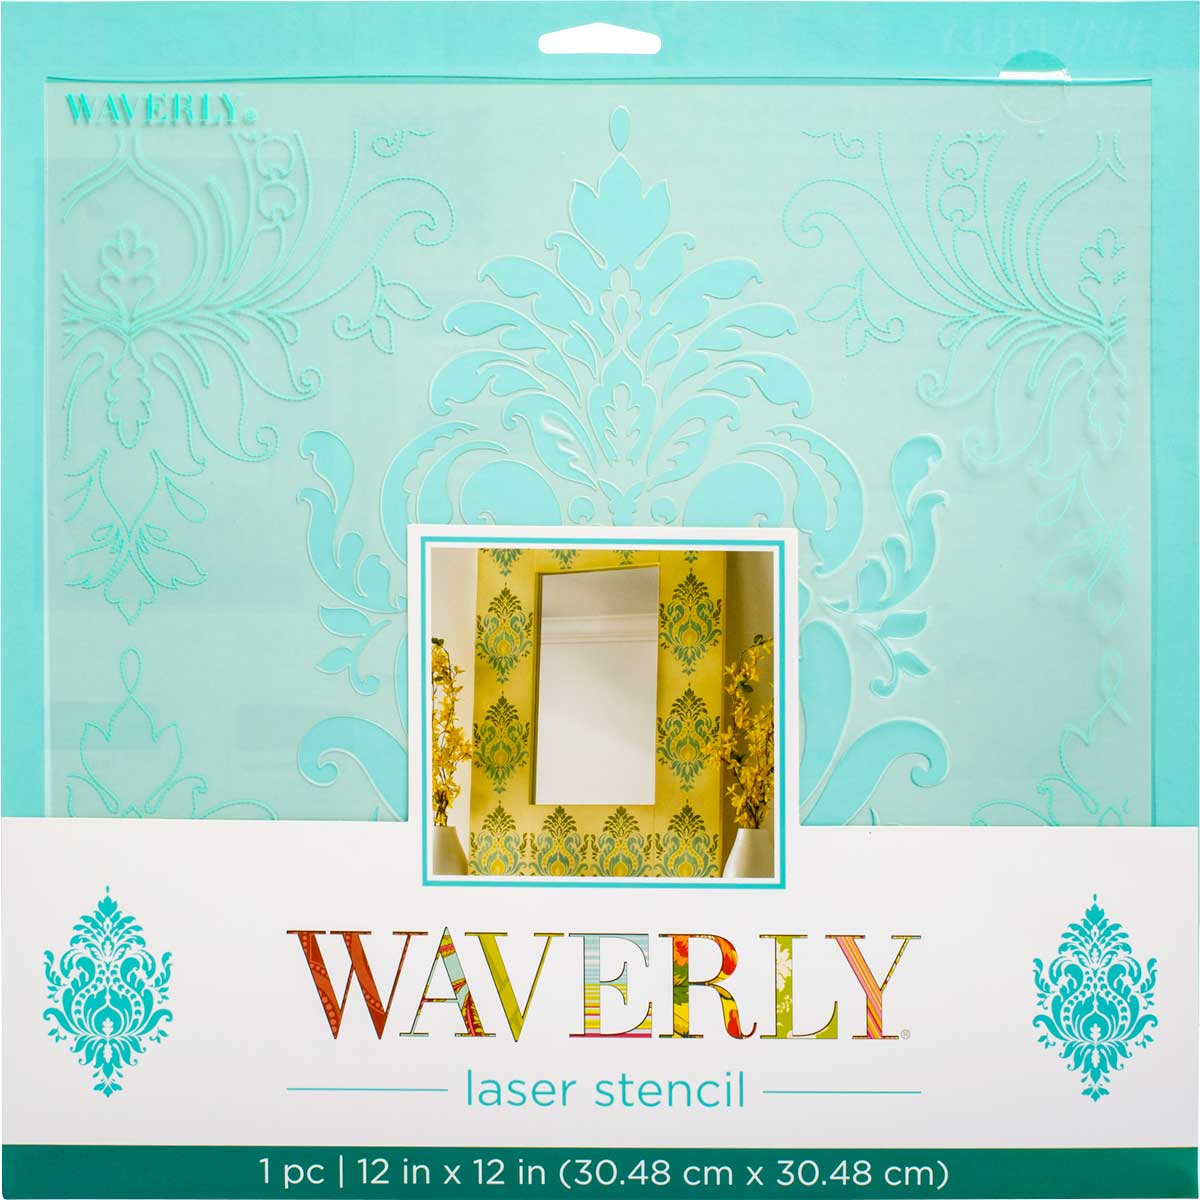 Waverly ® Laser Stencils - Dressed Damask, 12